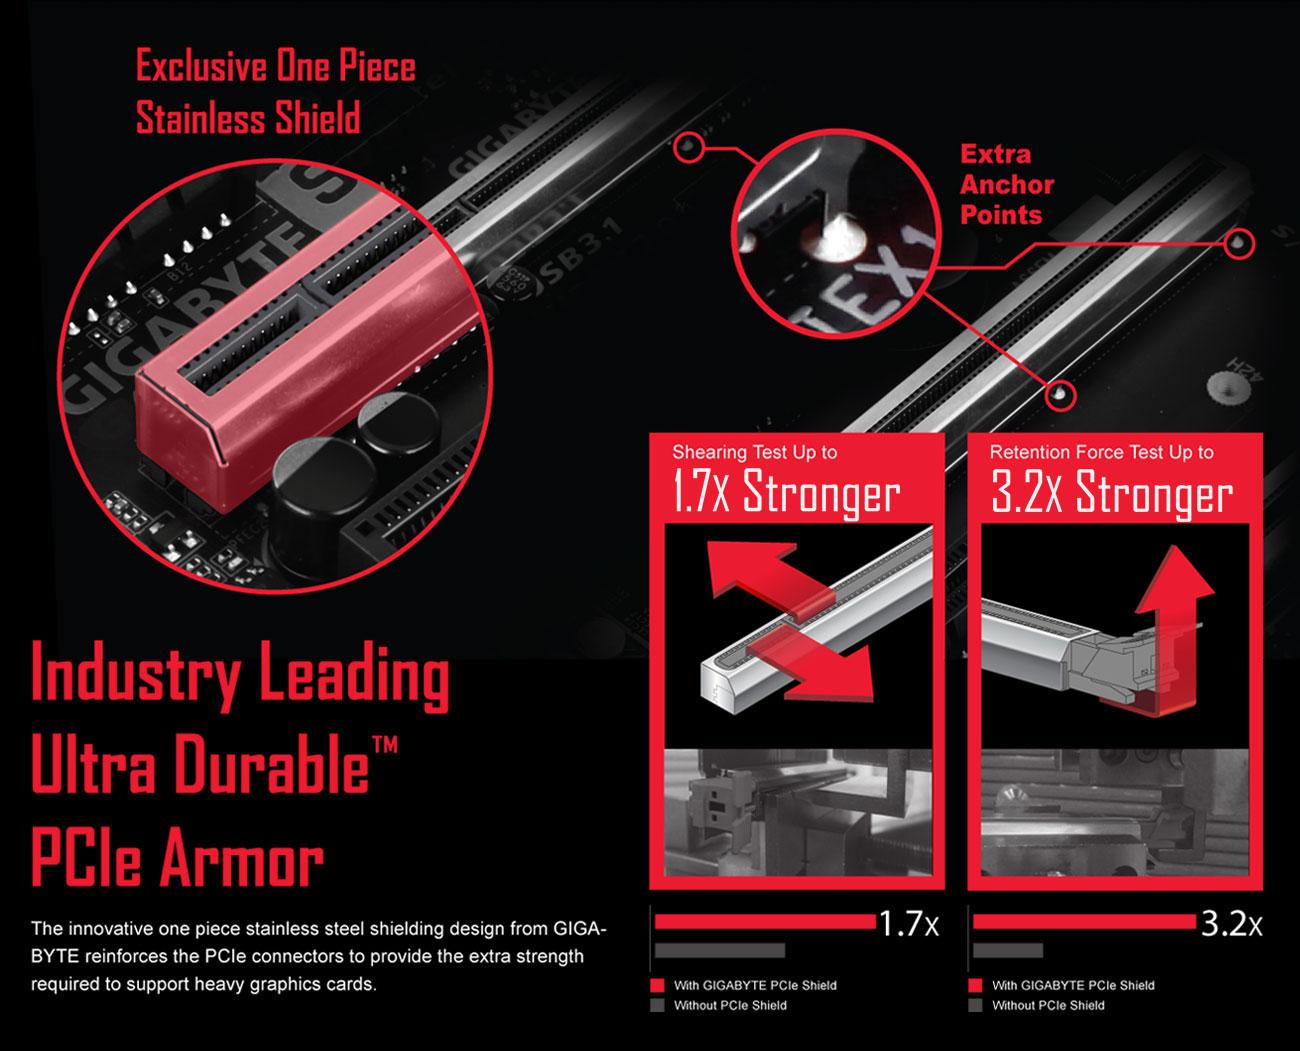 GIGABYTE GA-AX370-Gaming 3 AM4 ATX AMD Motherboard - Newegg com